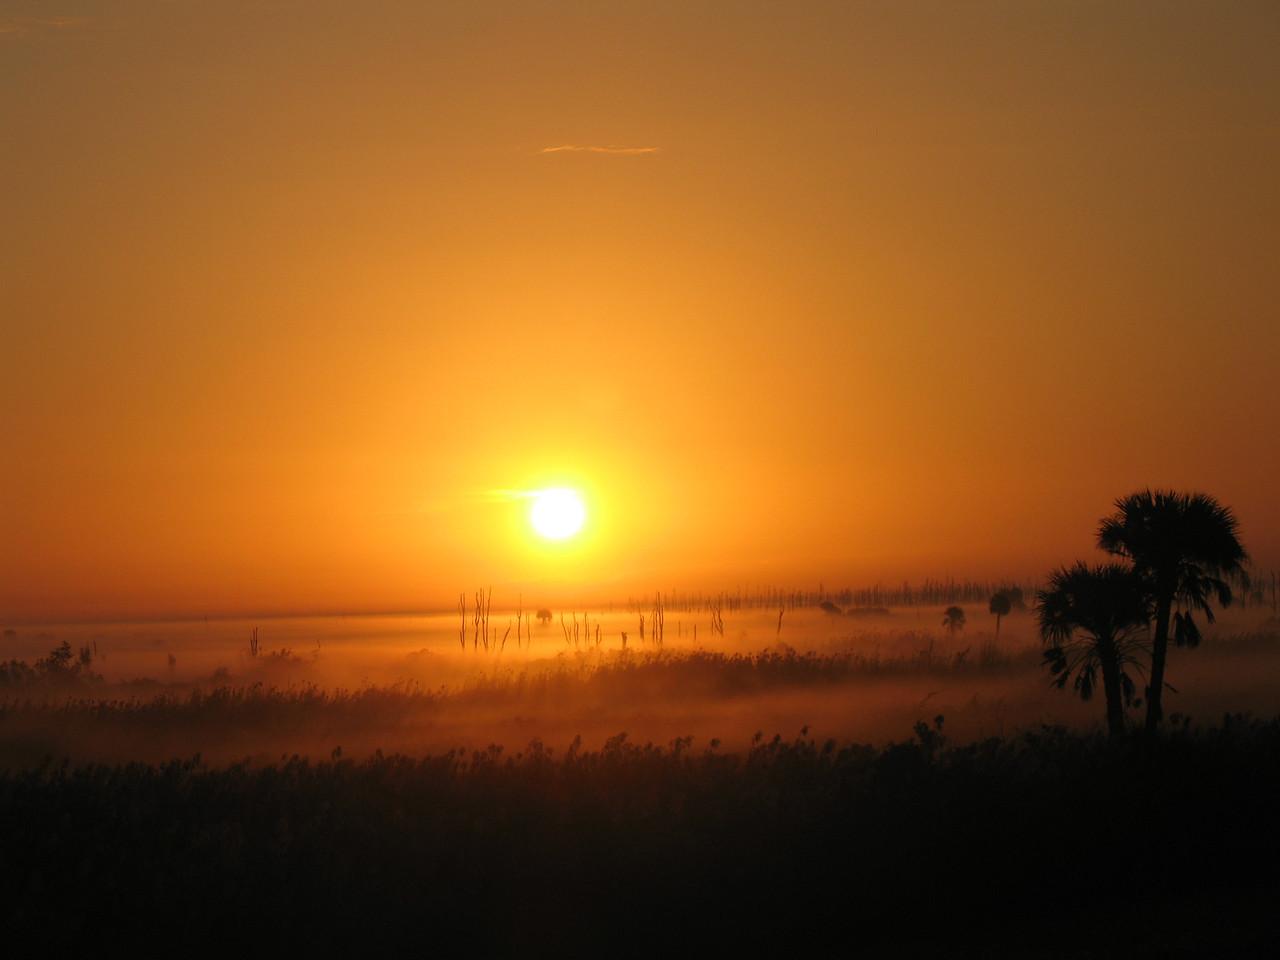 Sunrise at Moore Haven<br /> PHOTO CREDIT: Sandra Friend / Florida Trail Association